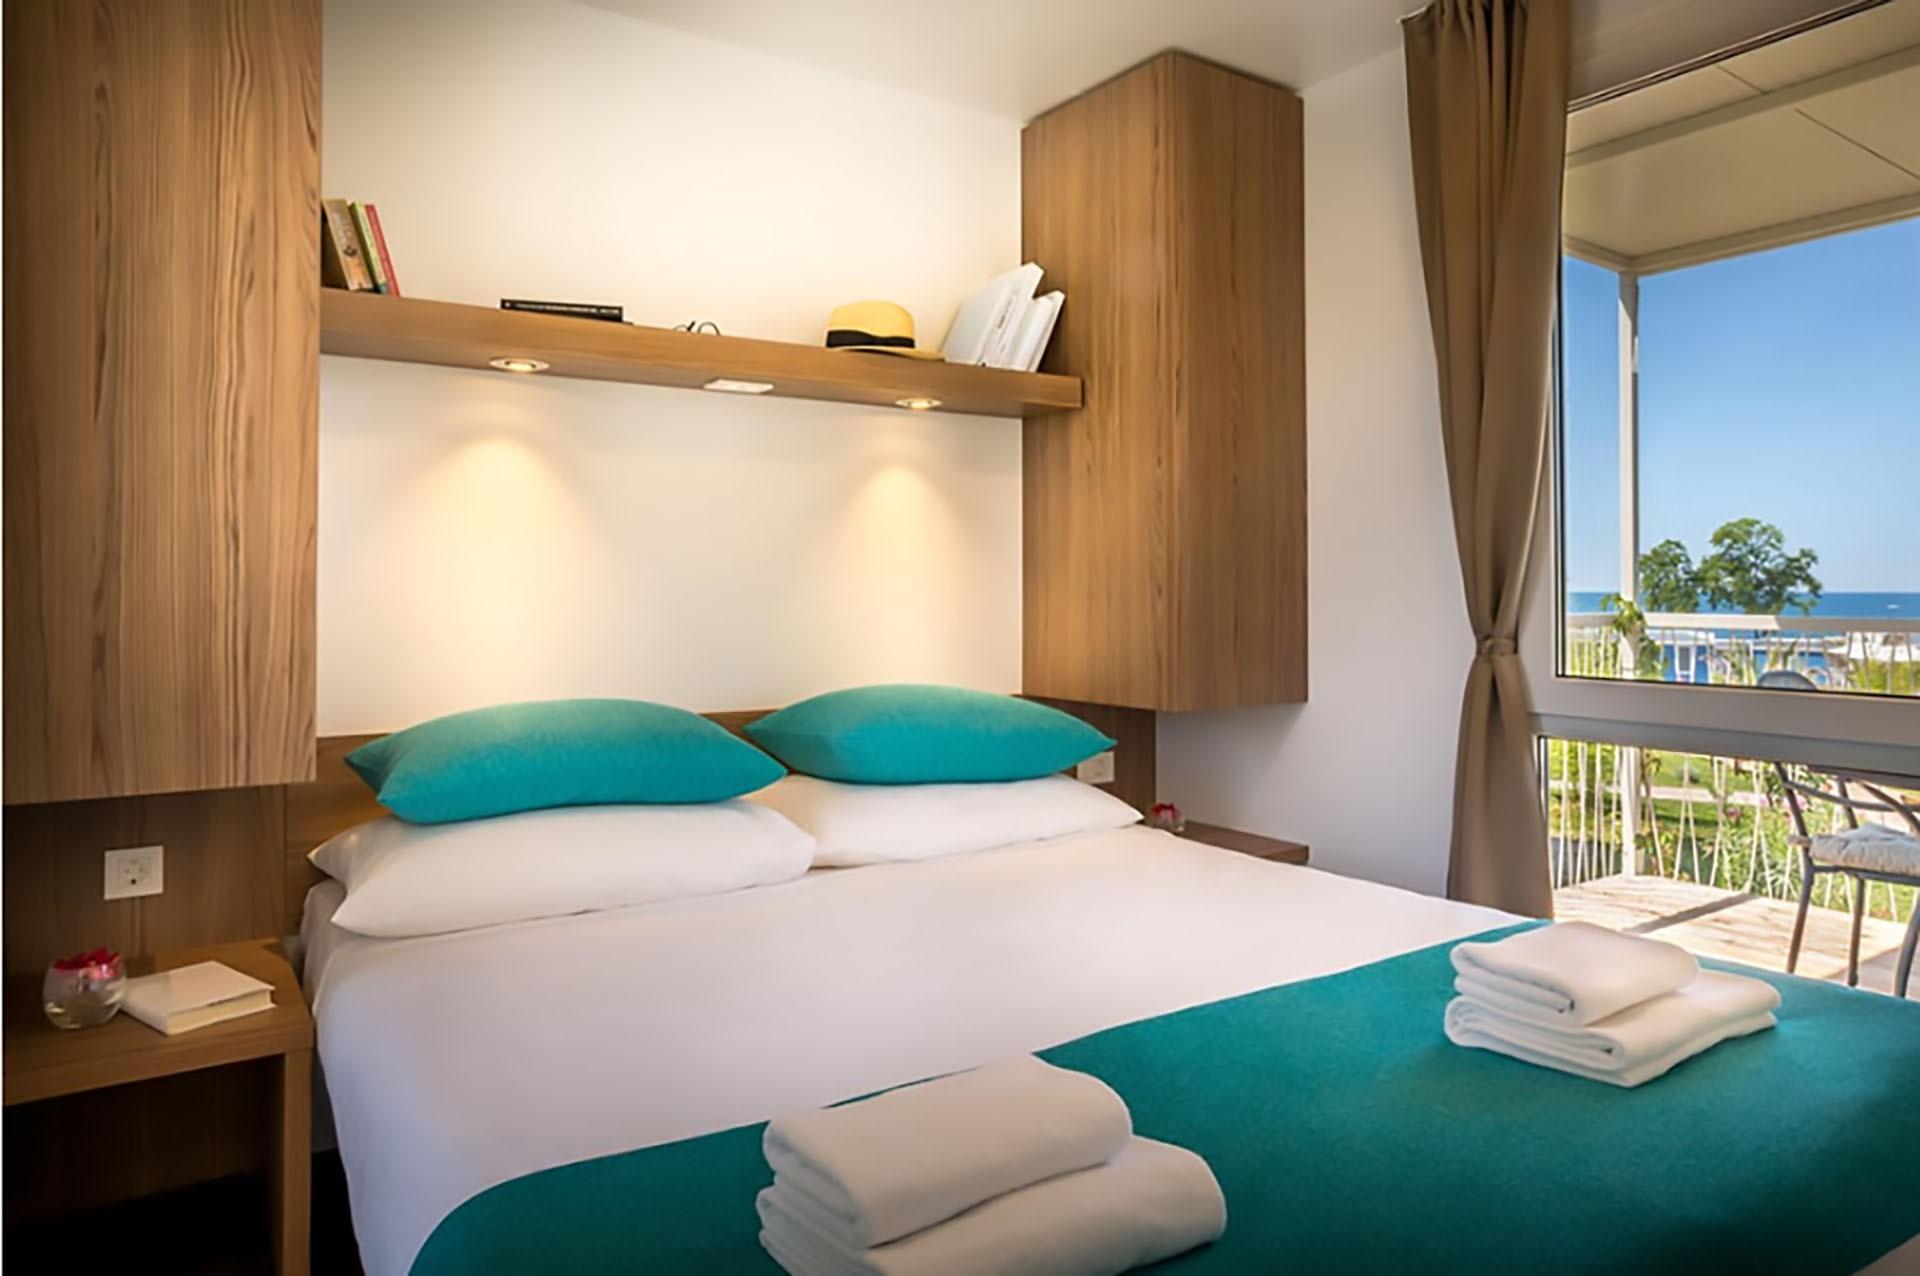 adria mobilehomes projekte camping mareda the leading european manufacturer of mobile. Black Bedroom Furniture Sets. Home Design Ideas